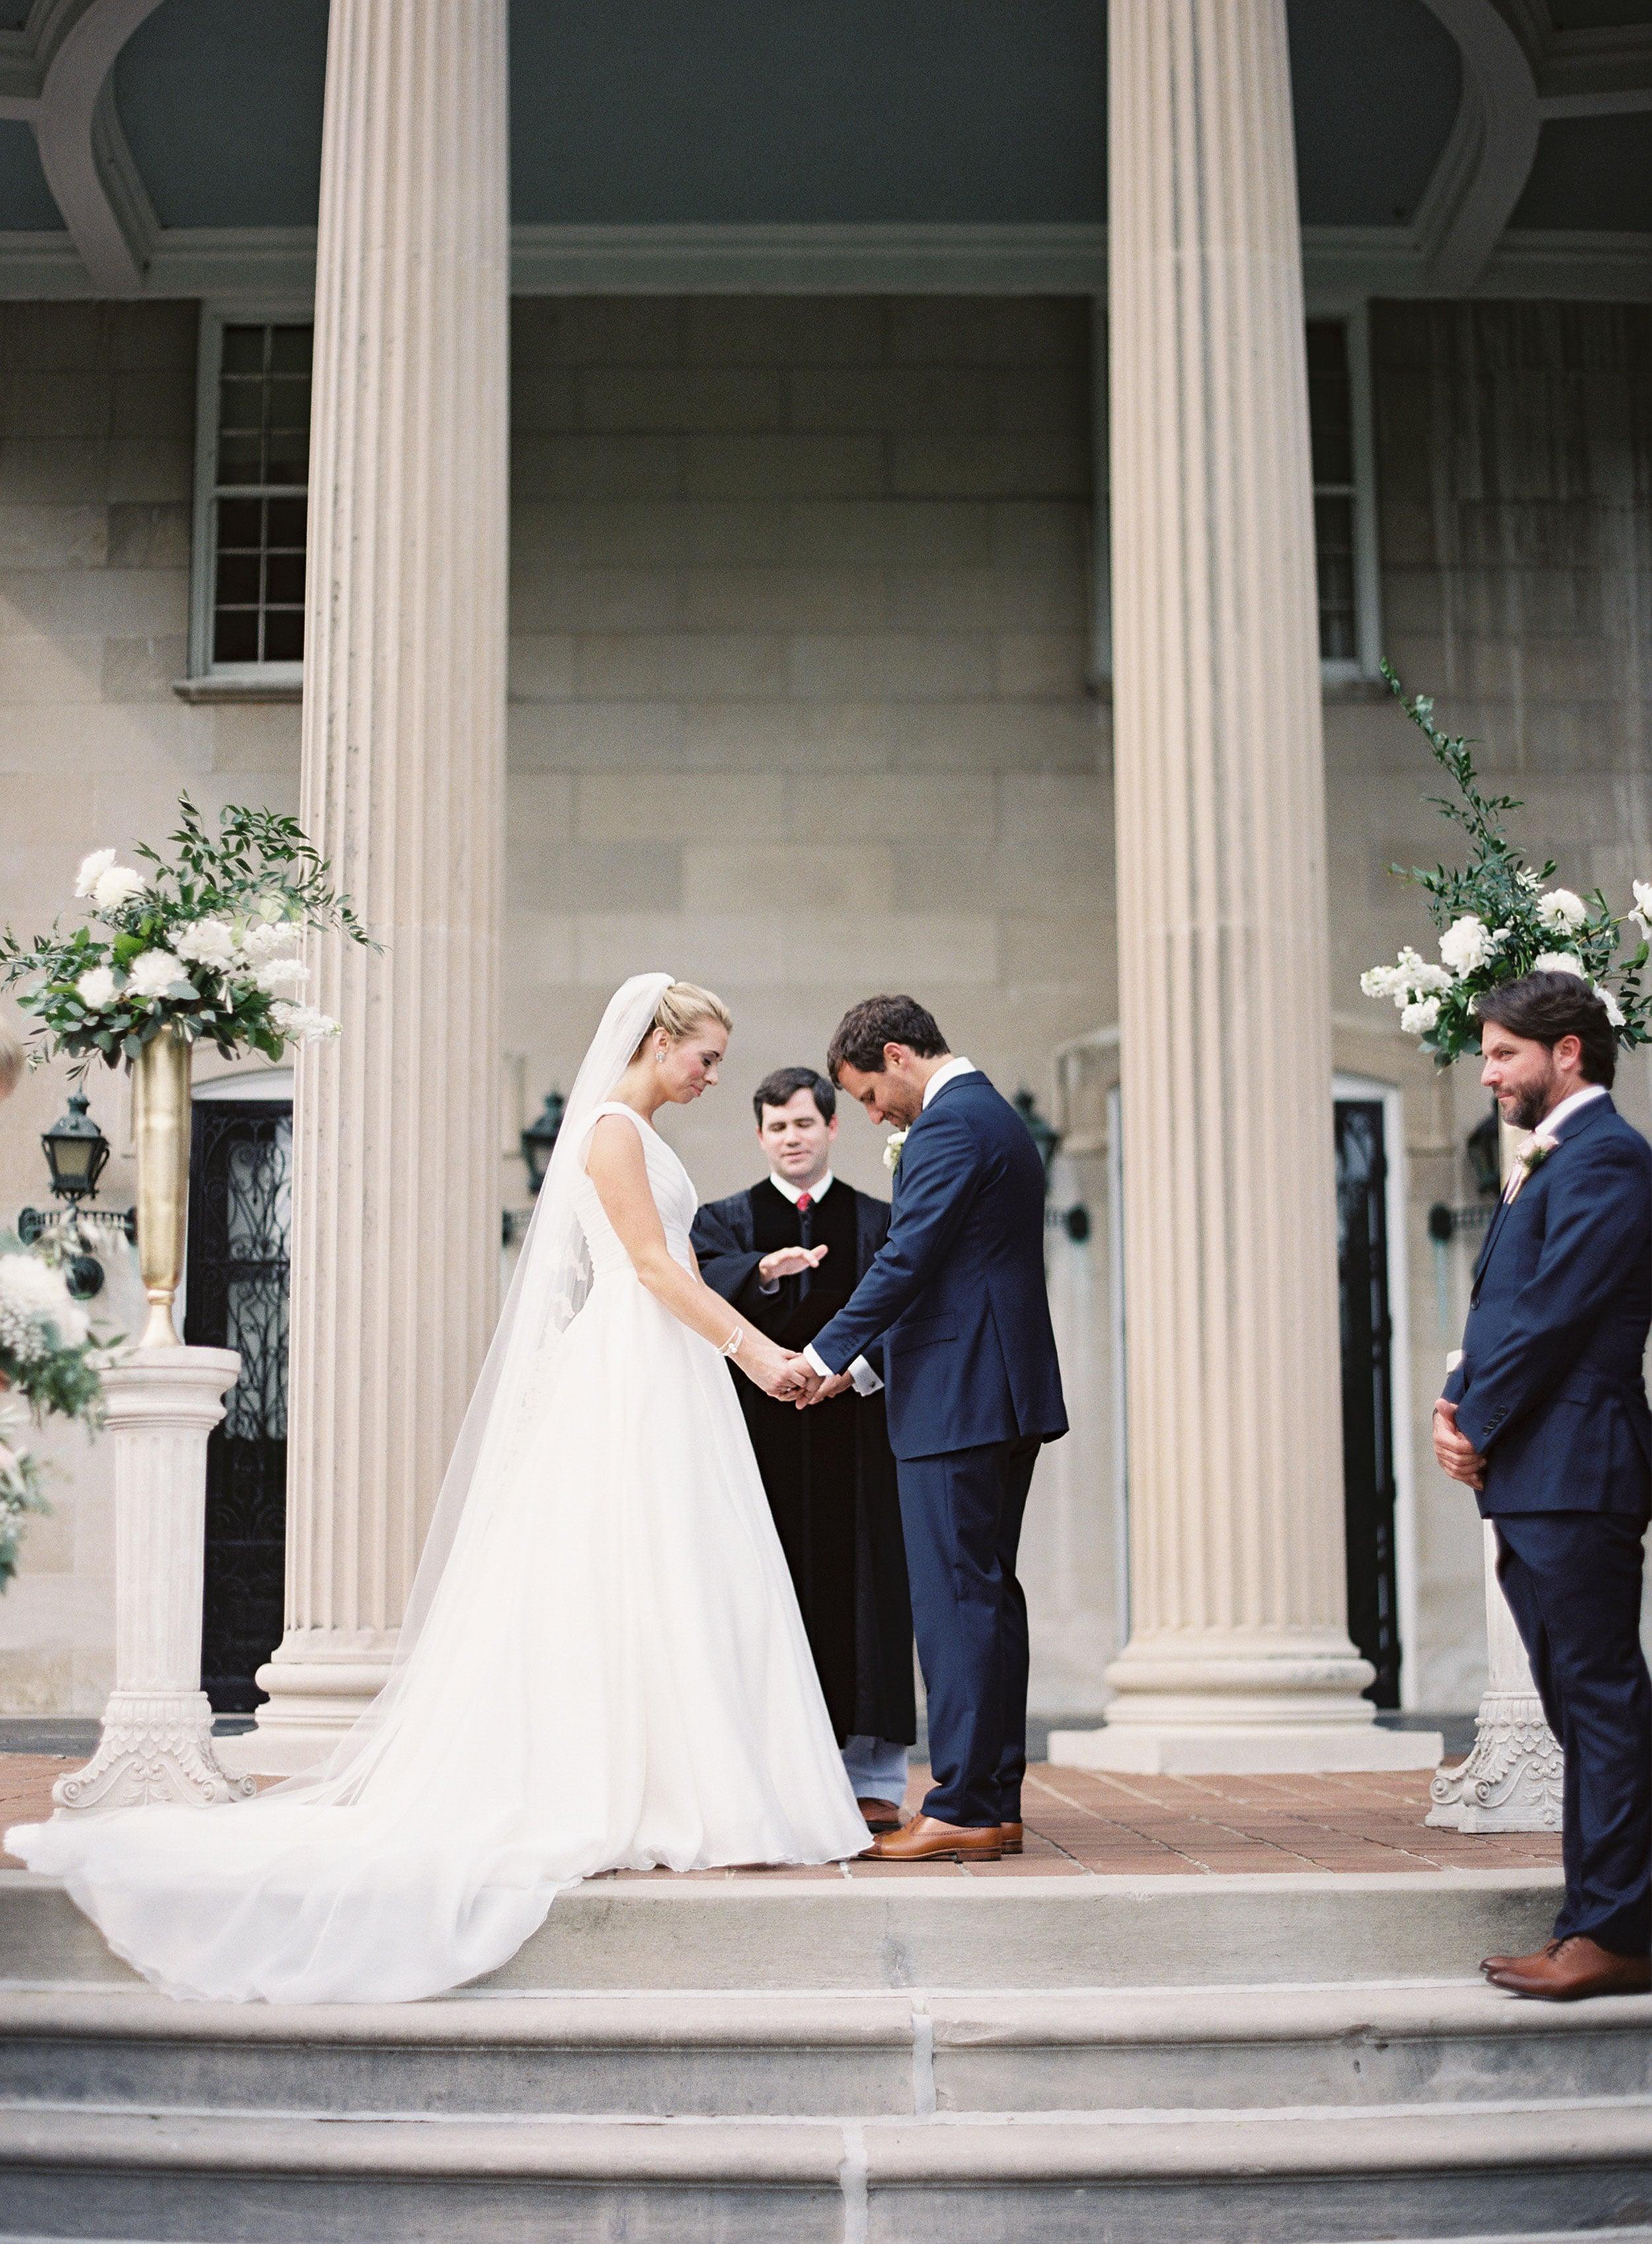 spindletop-lexington-wedding-photographer-026.JPG